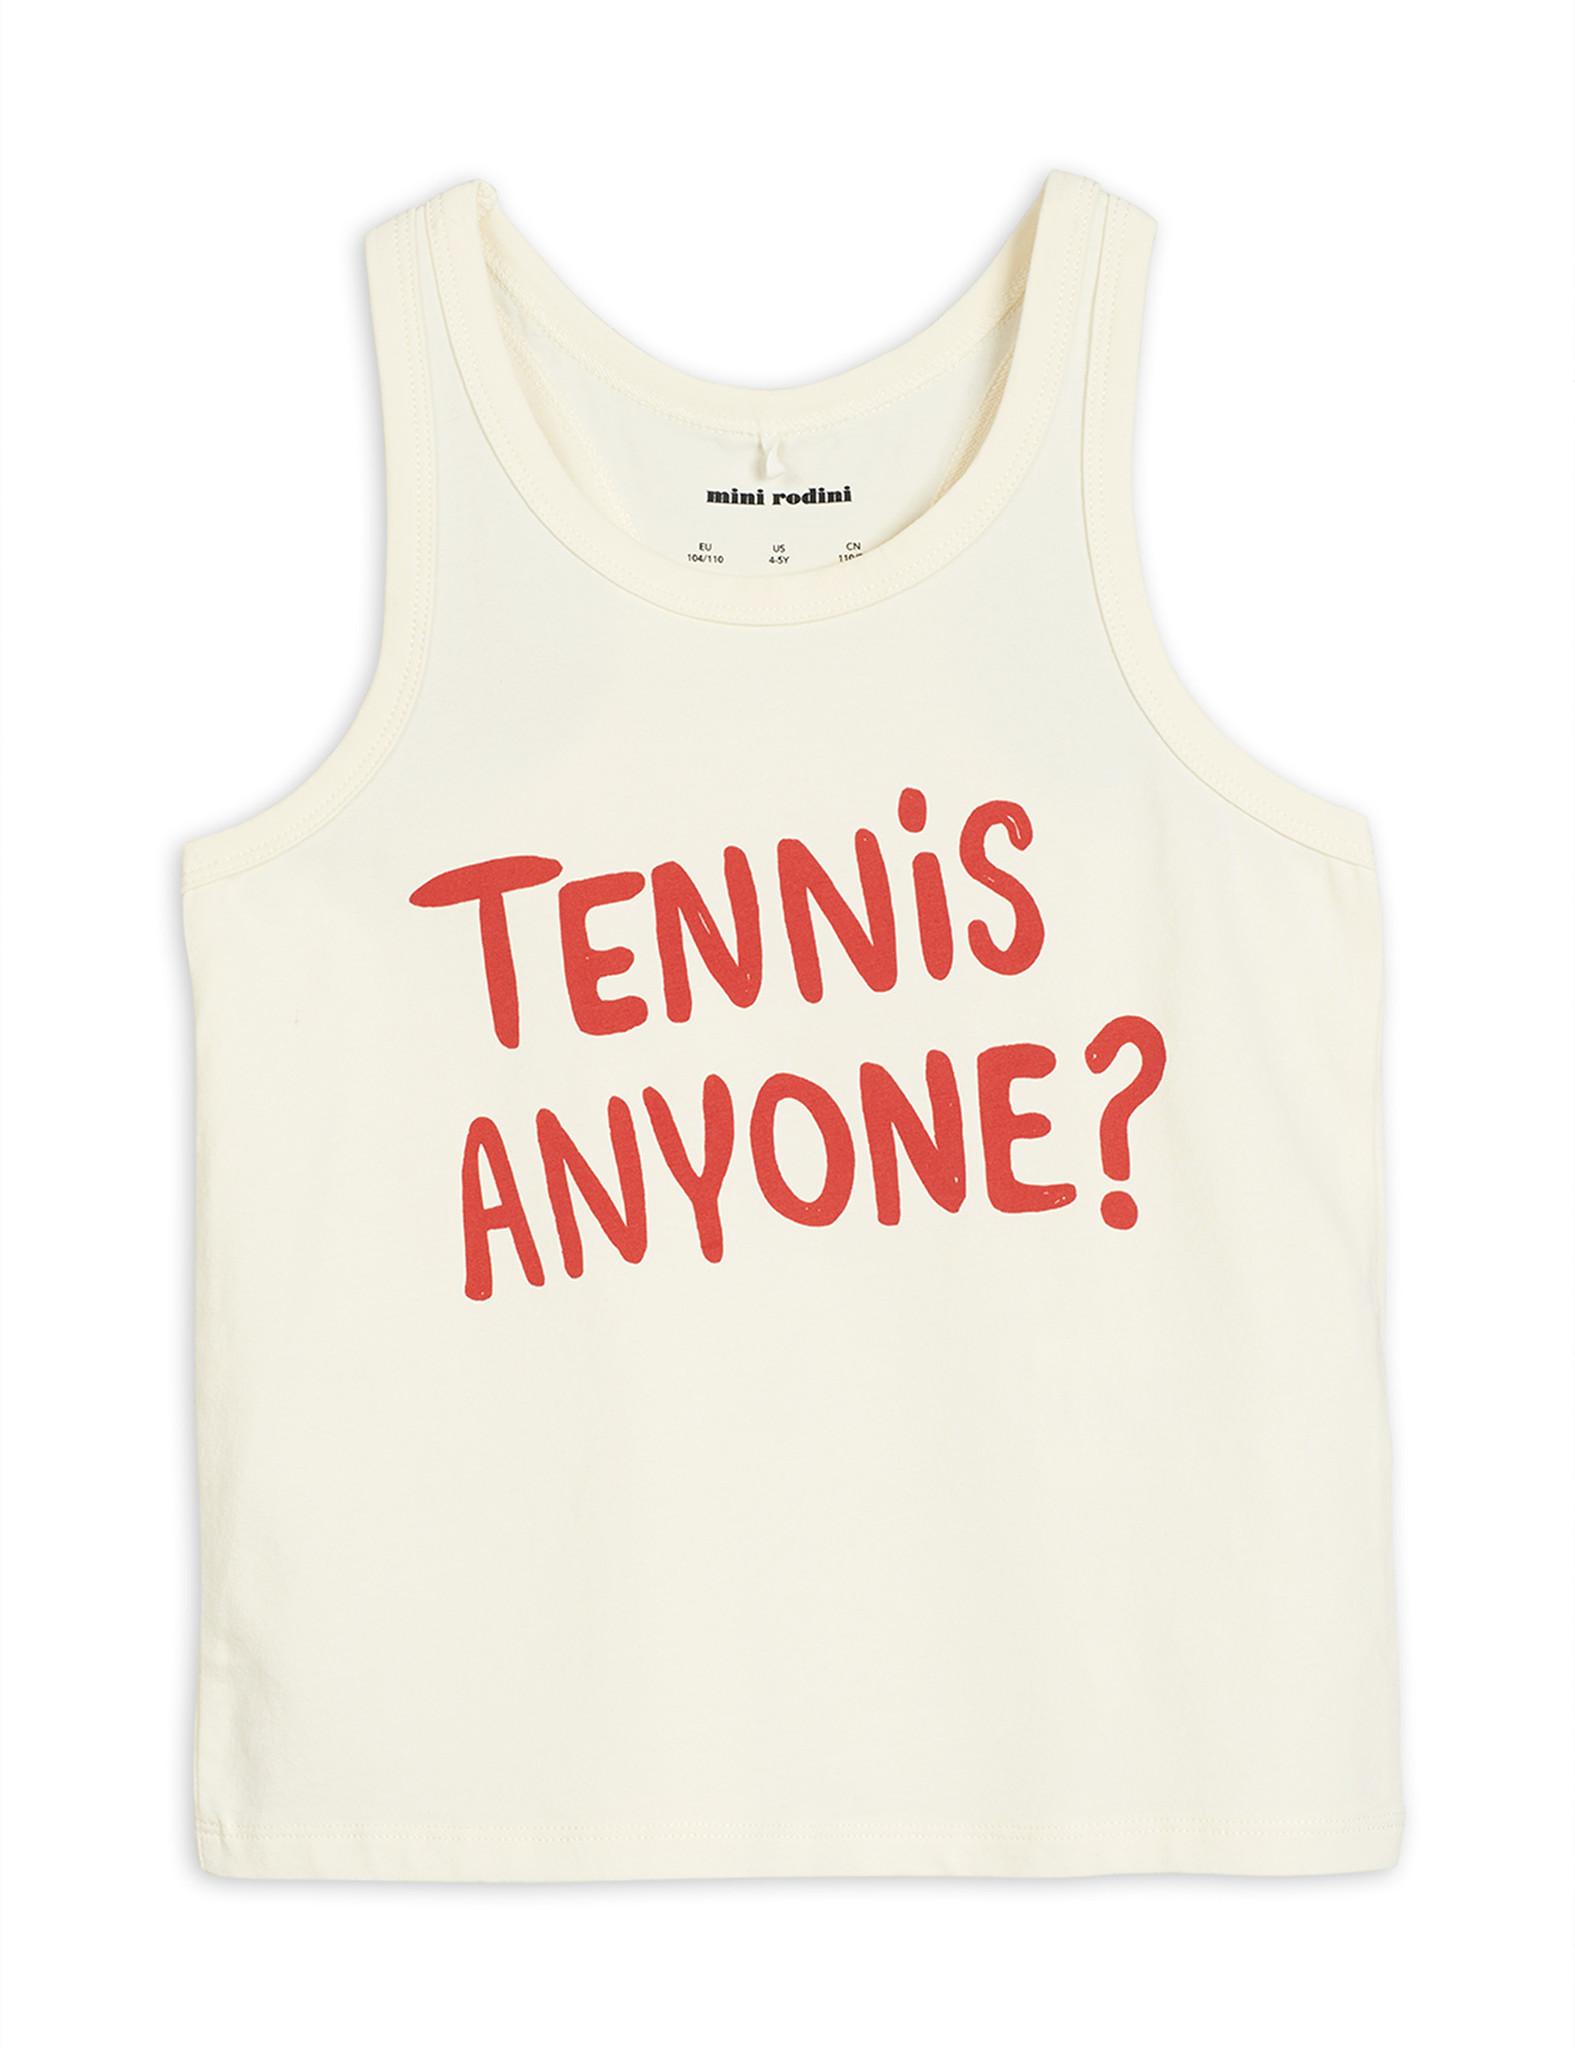 Tennis anyone tank - Offwhite-1